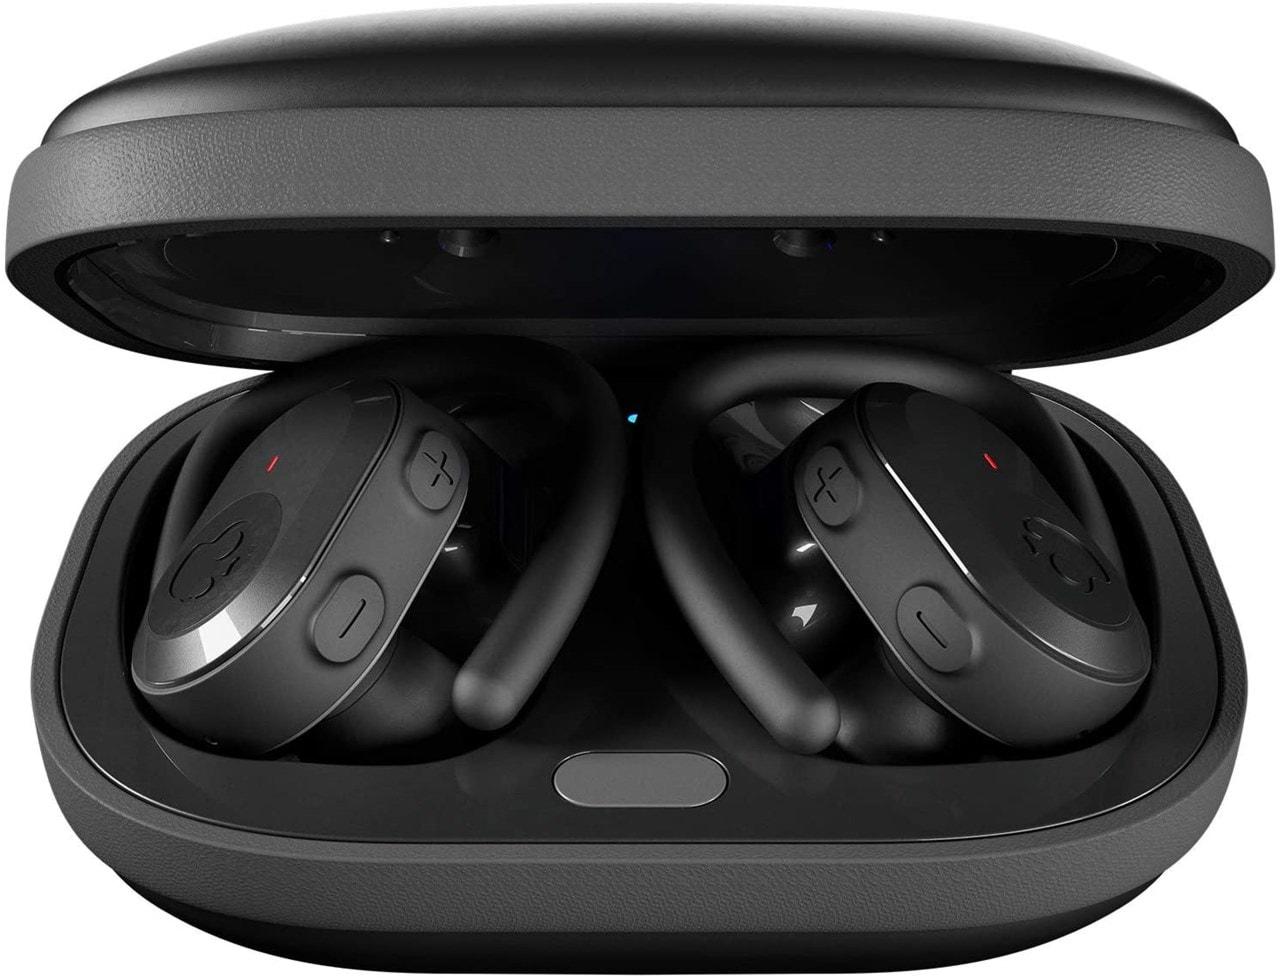 Skullcandy Push Ultra True Black True Wireless Earphones - 2